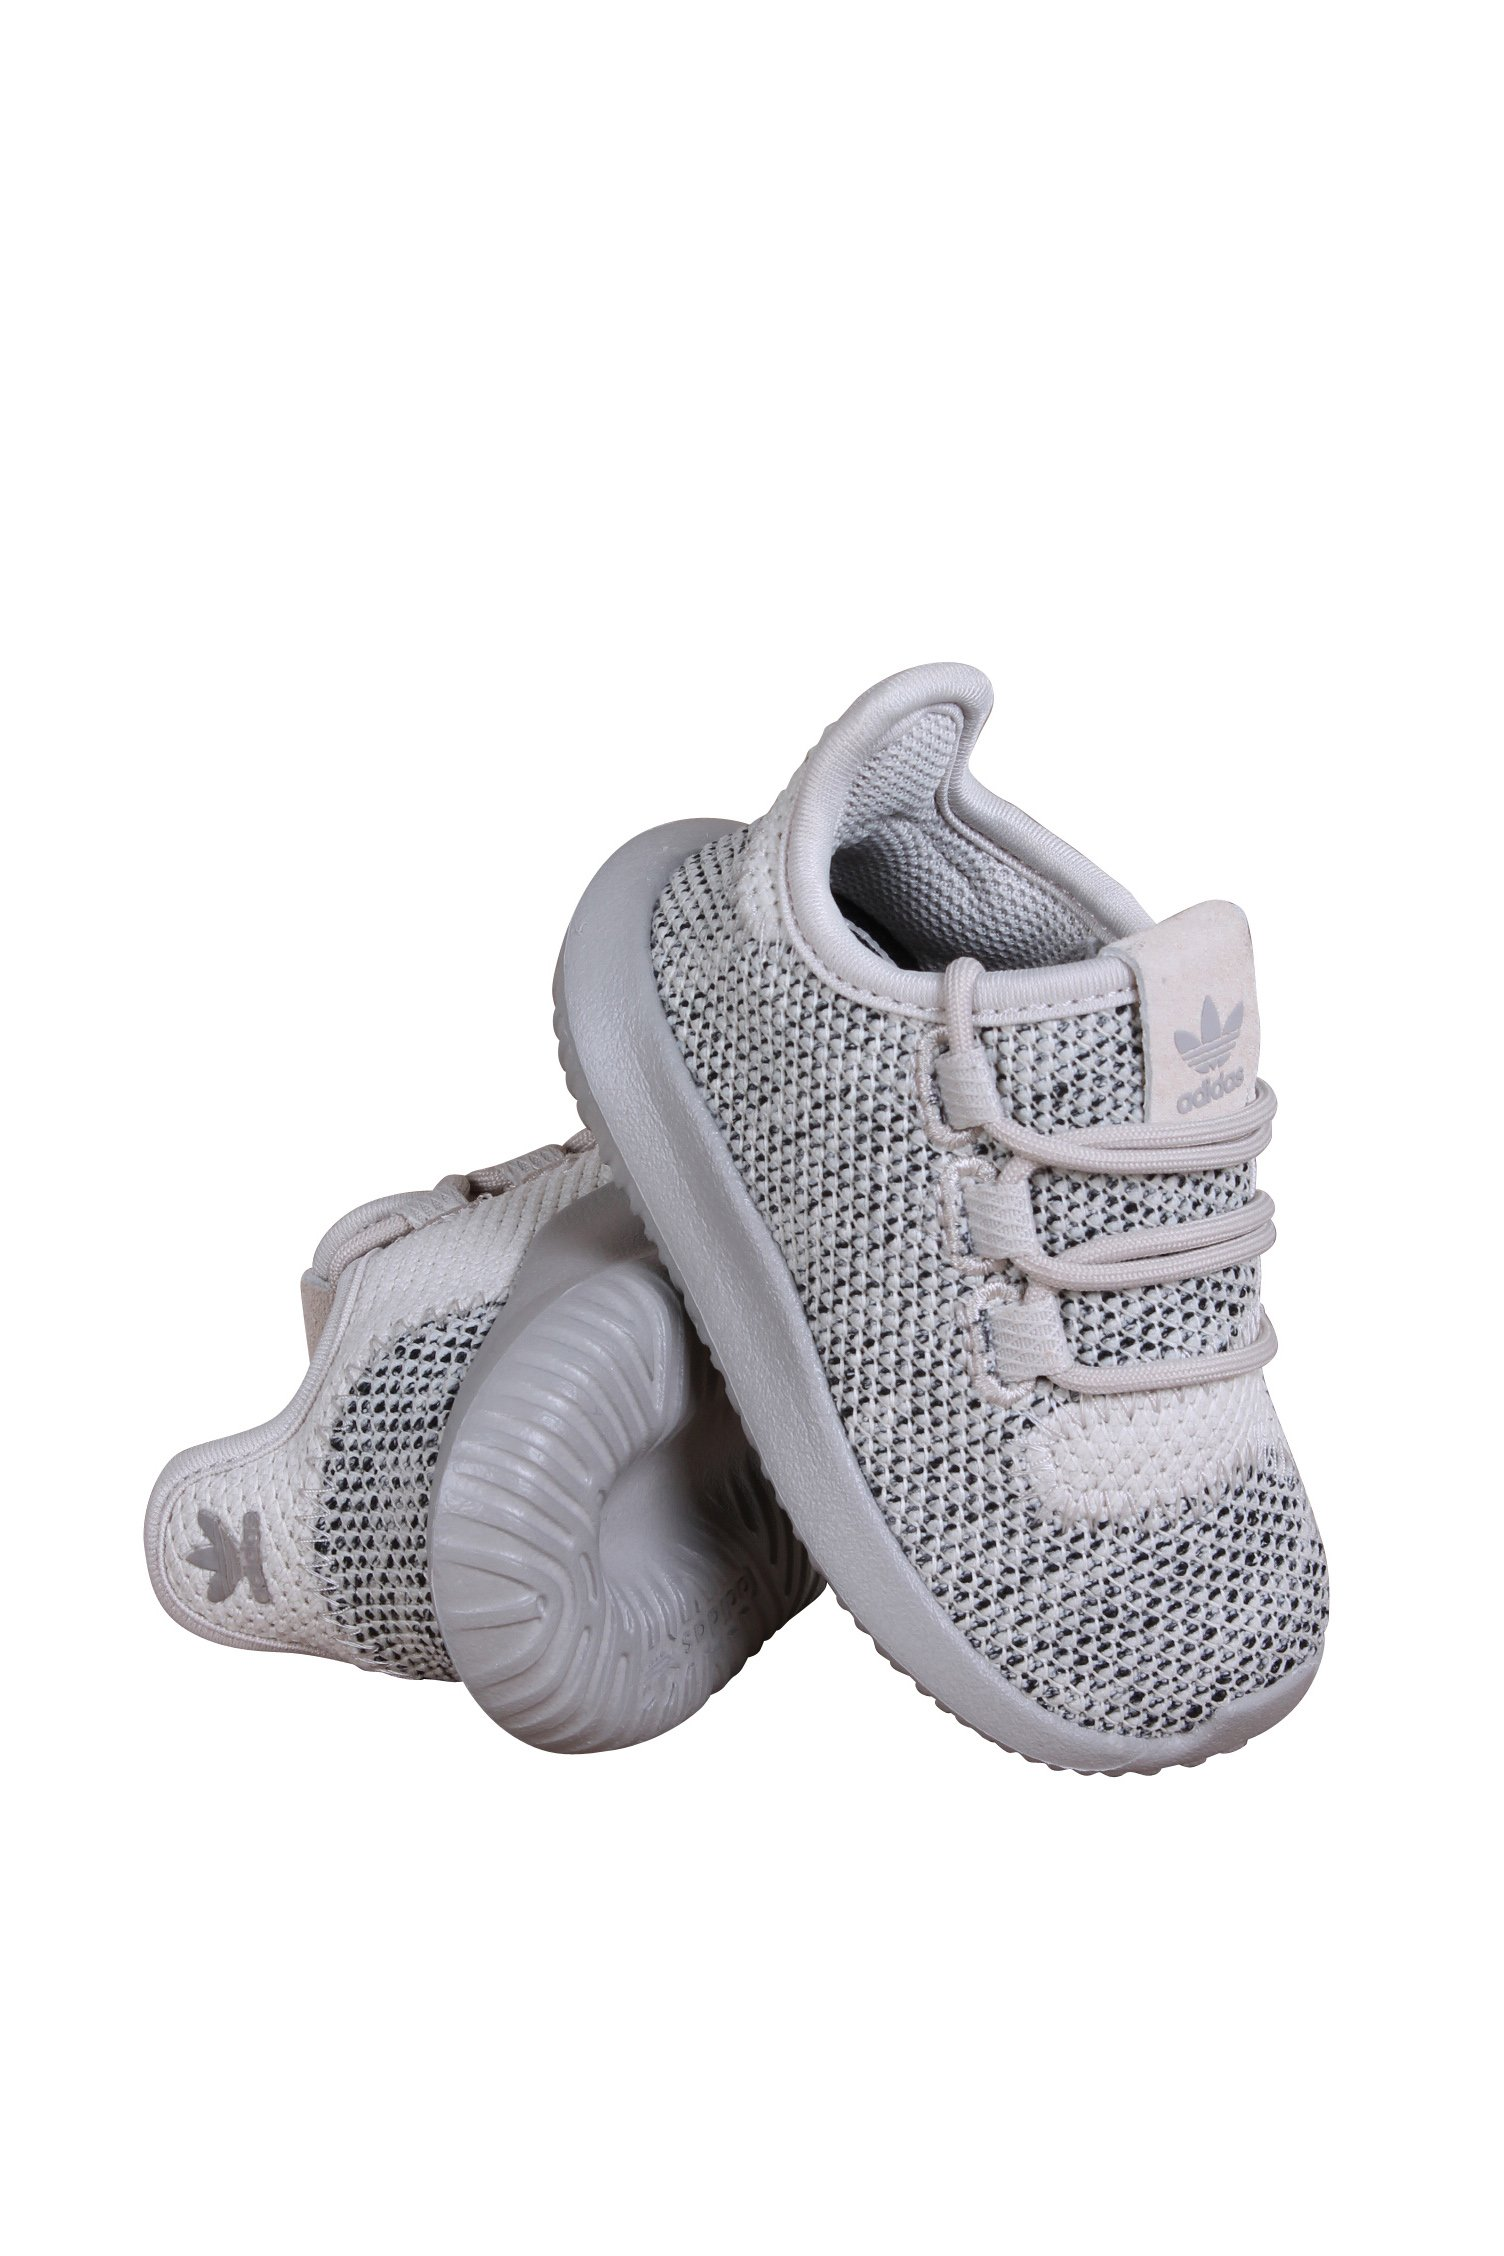 adidas Originals Boys' Tubular Shadow I Sneaker, Clear/Brown/Collegiate Silver/Black, 8 M US Toddler